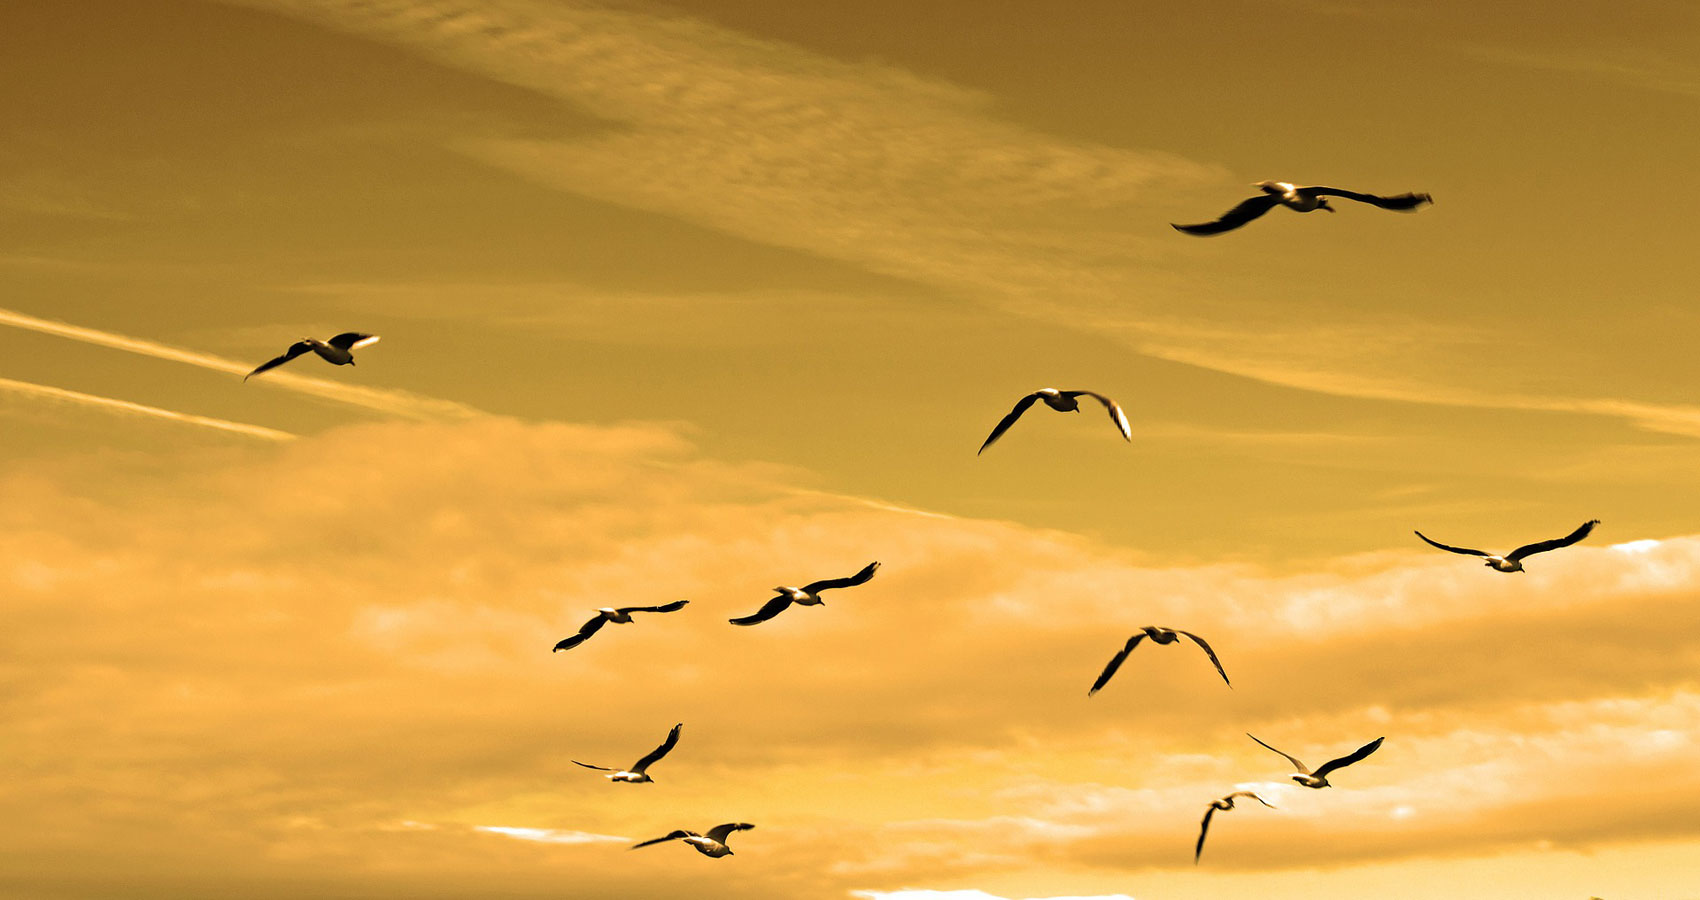 Gulls of Brimstone by Mileva Anastasiadou at Spillwords.com